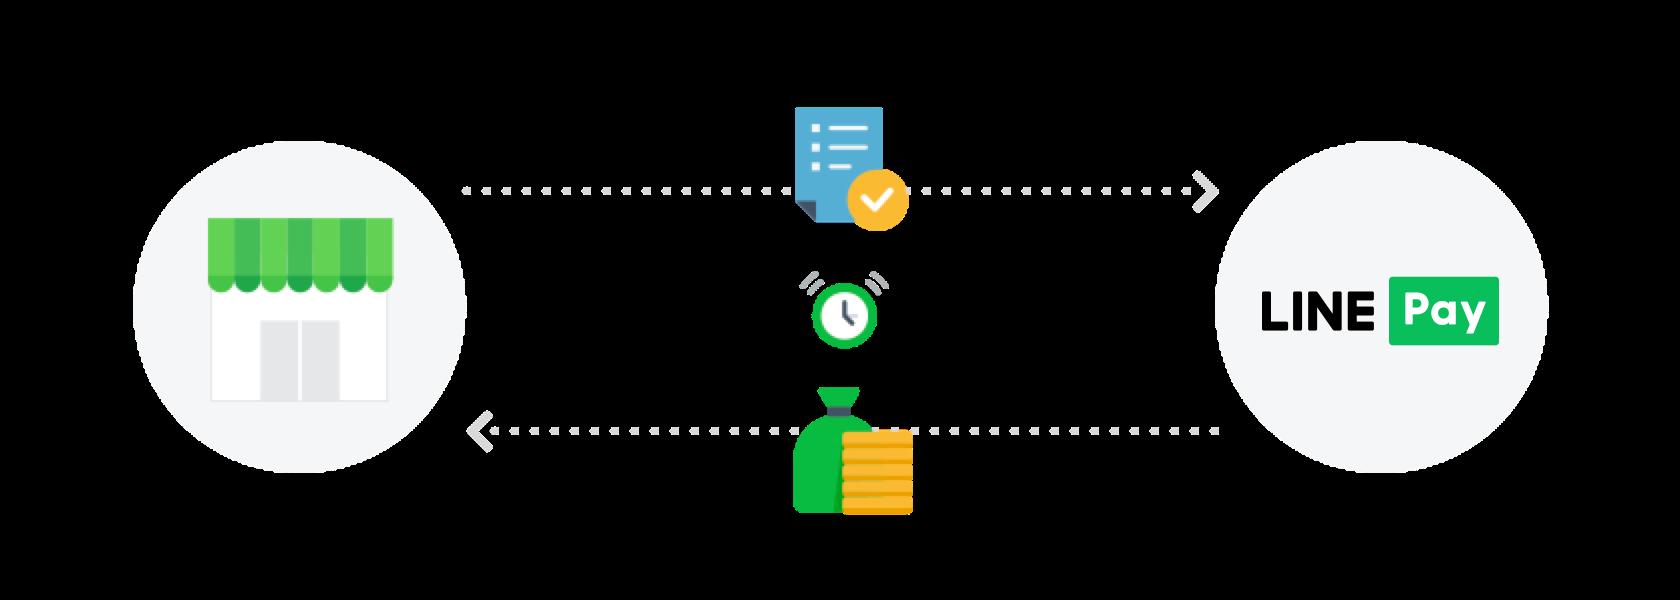 About Service : LINE Pay Merchant